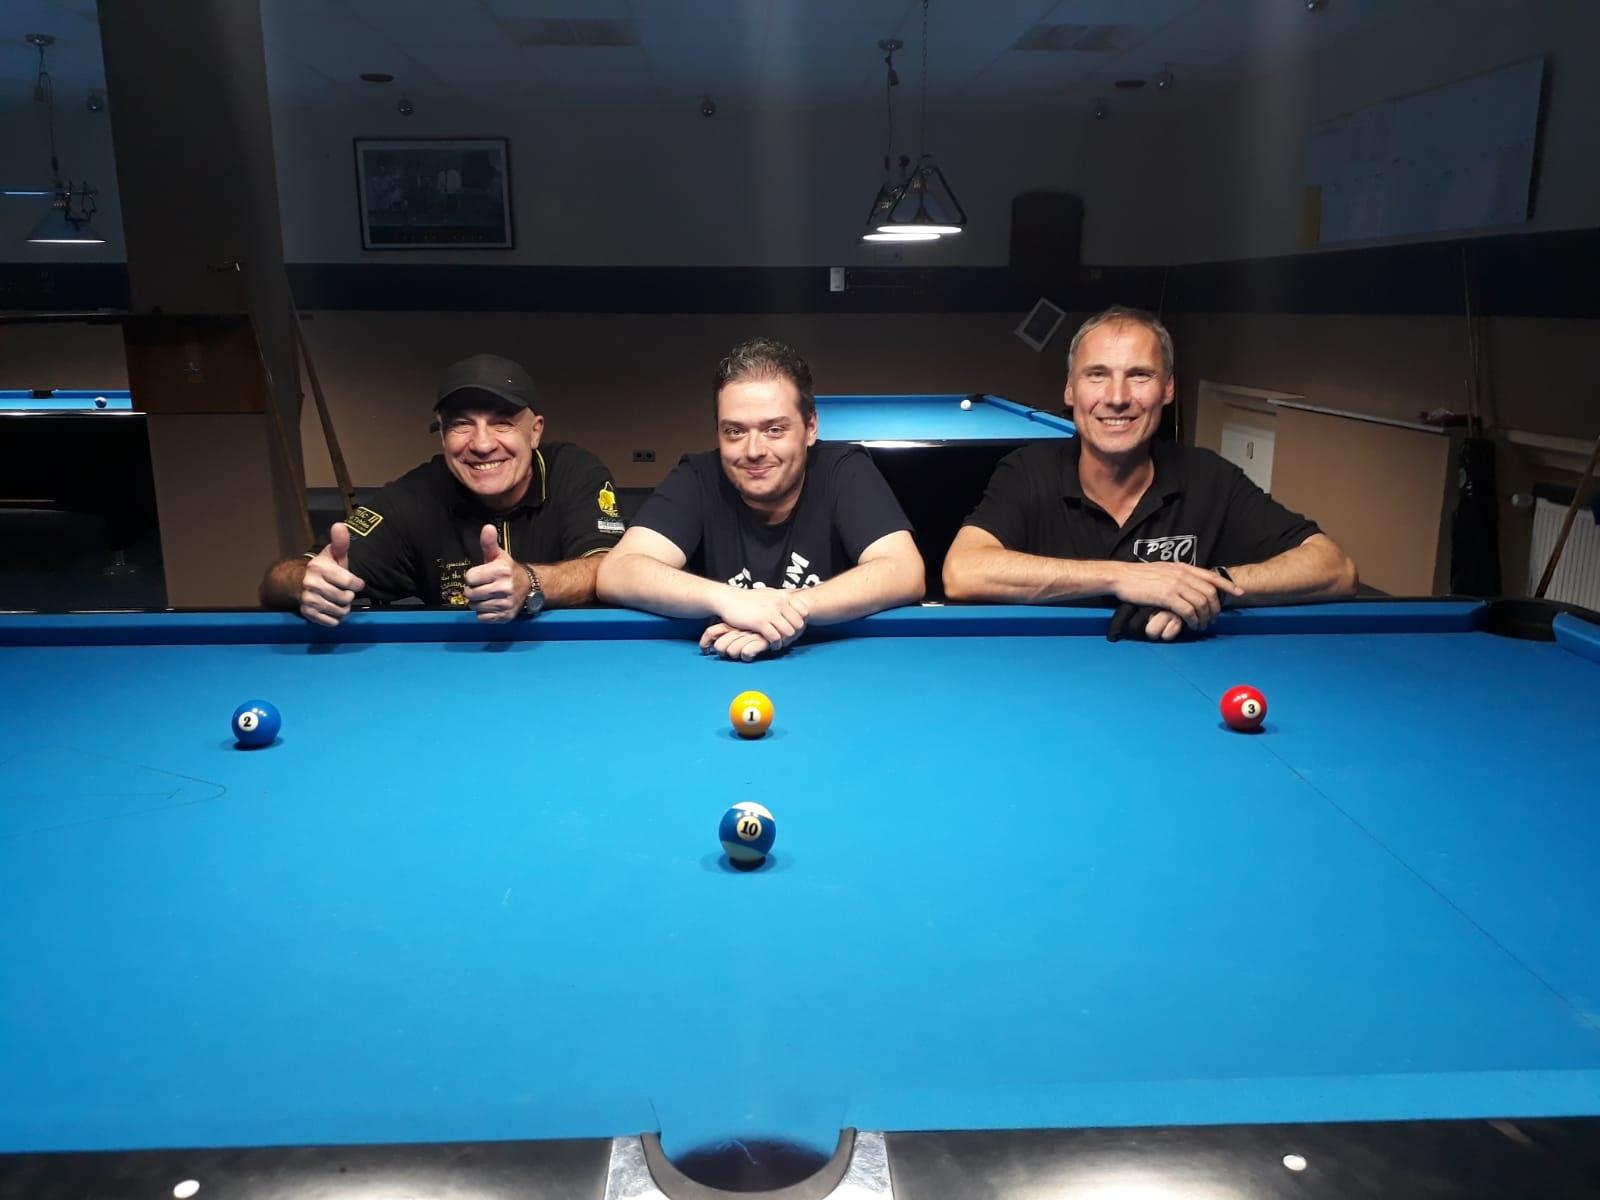 Ibrahim Dzino (Platz 2), Markus Schwarz (Platz 1) undMario Zorn (Platz 3)